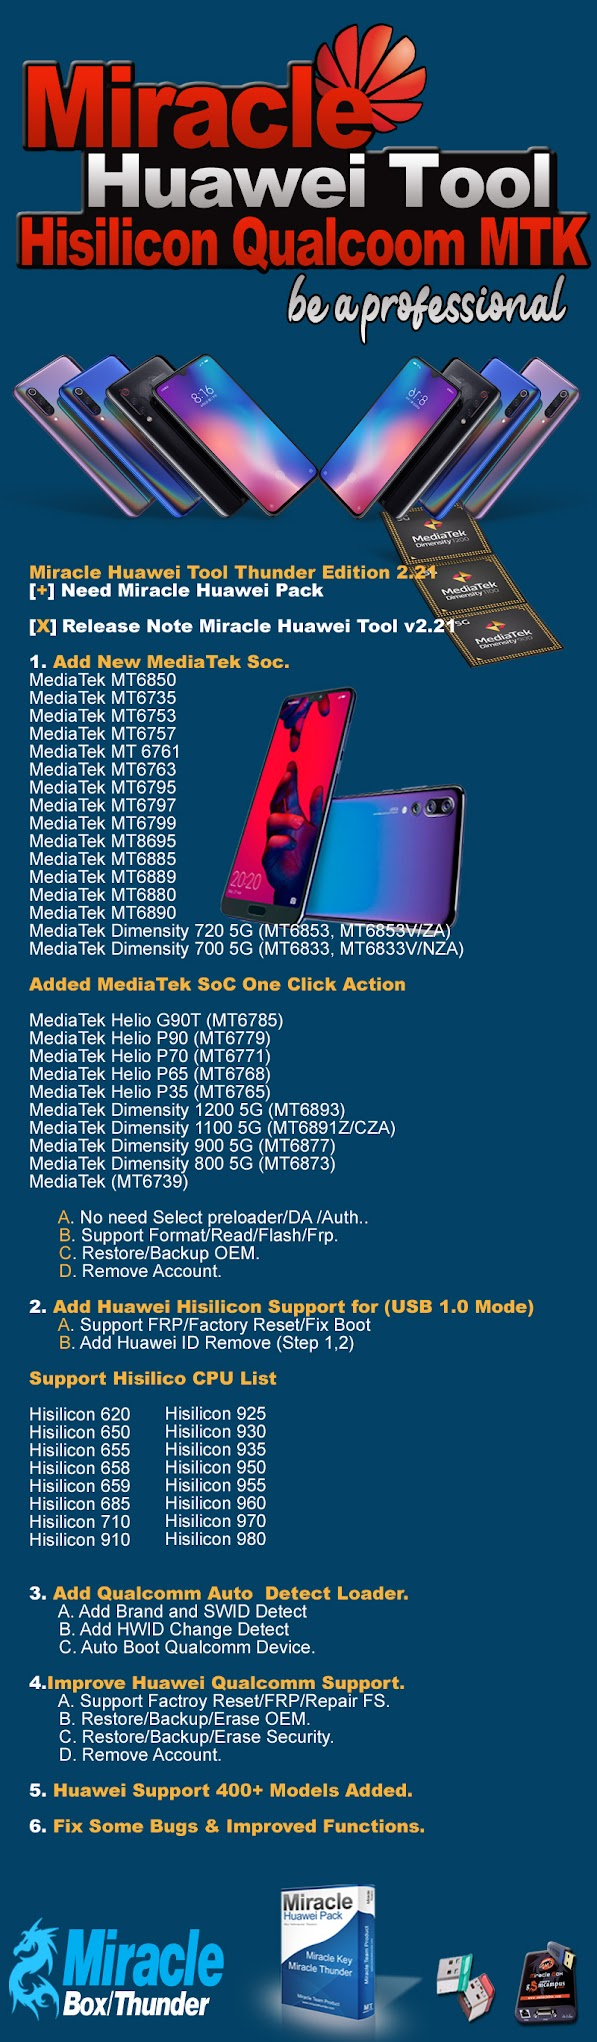 Miracle Huawei Tool v2.21